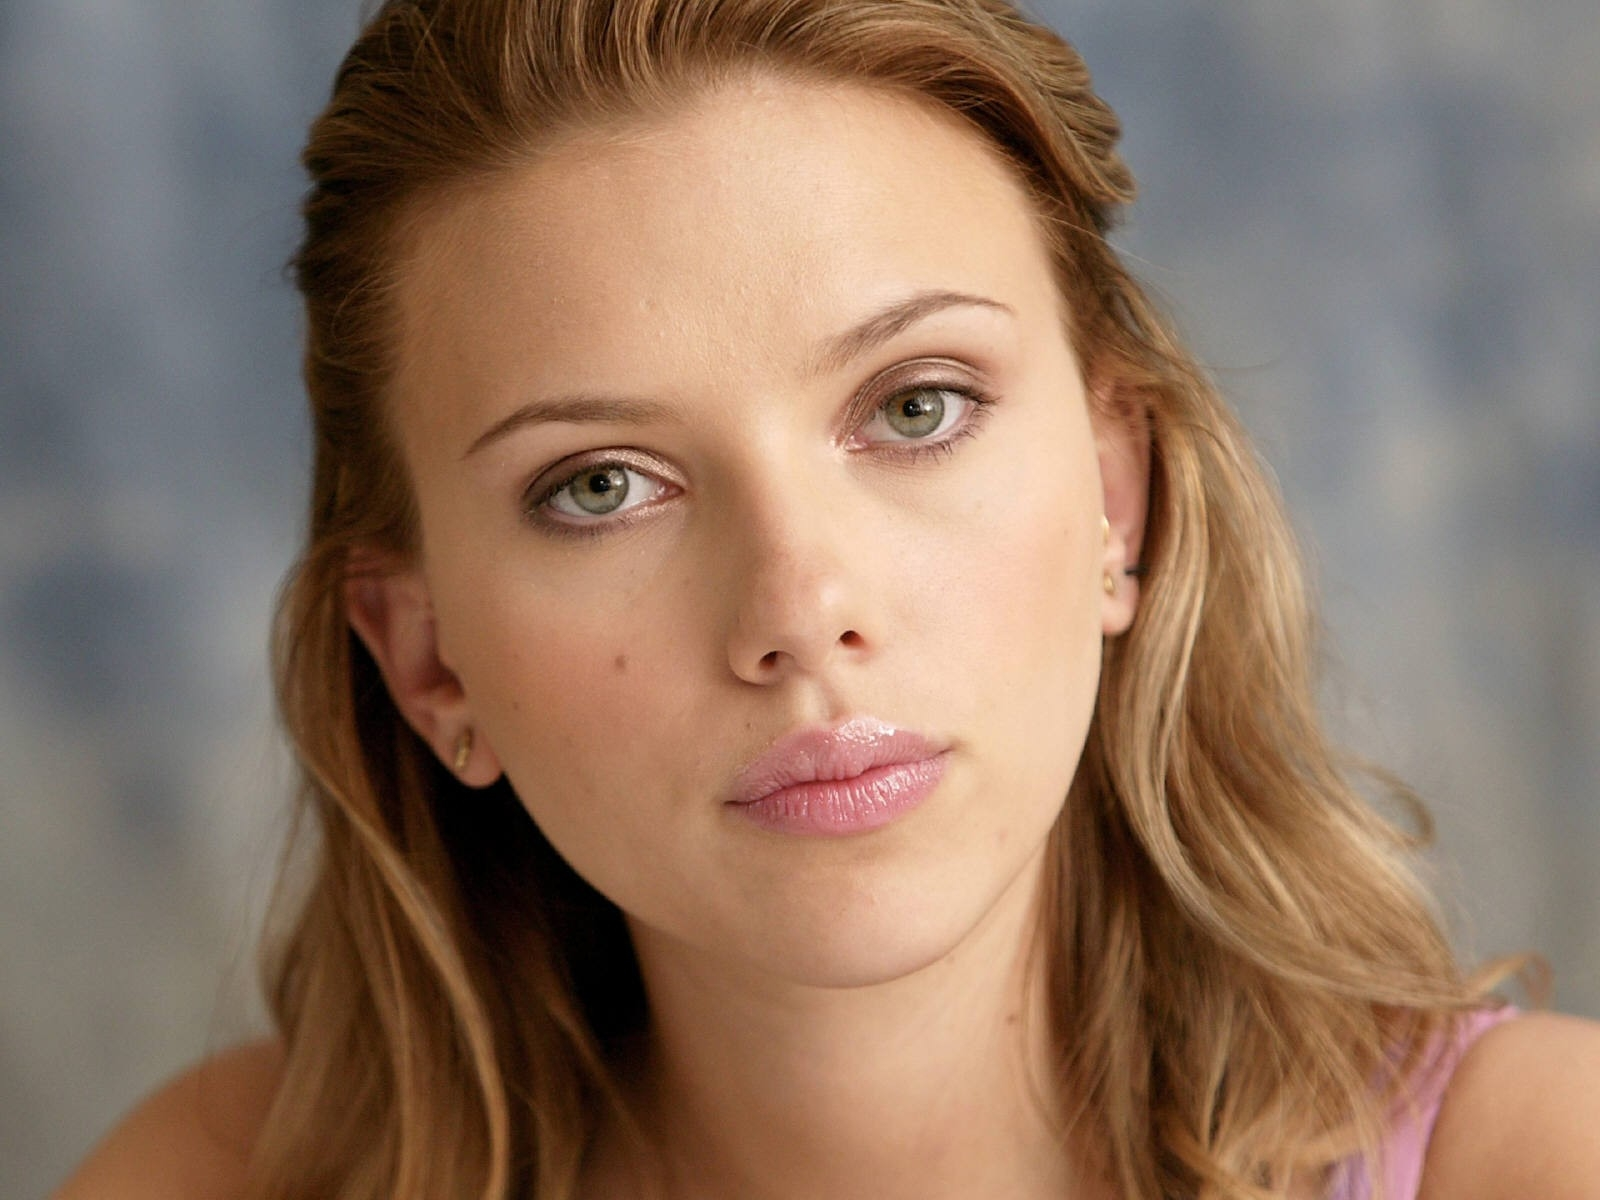 Scarlett Johansson Archives - HDWallSource.com